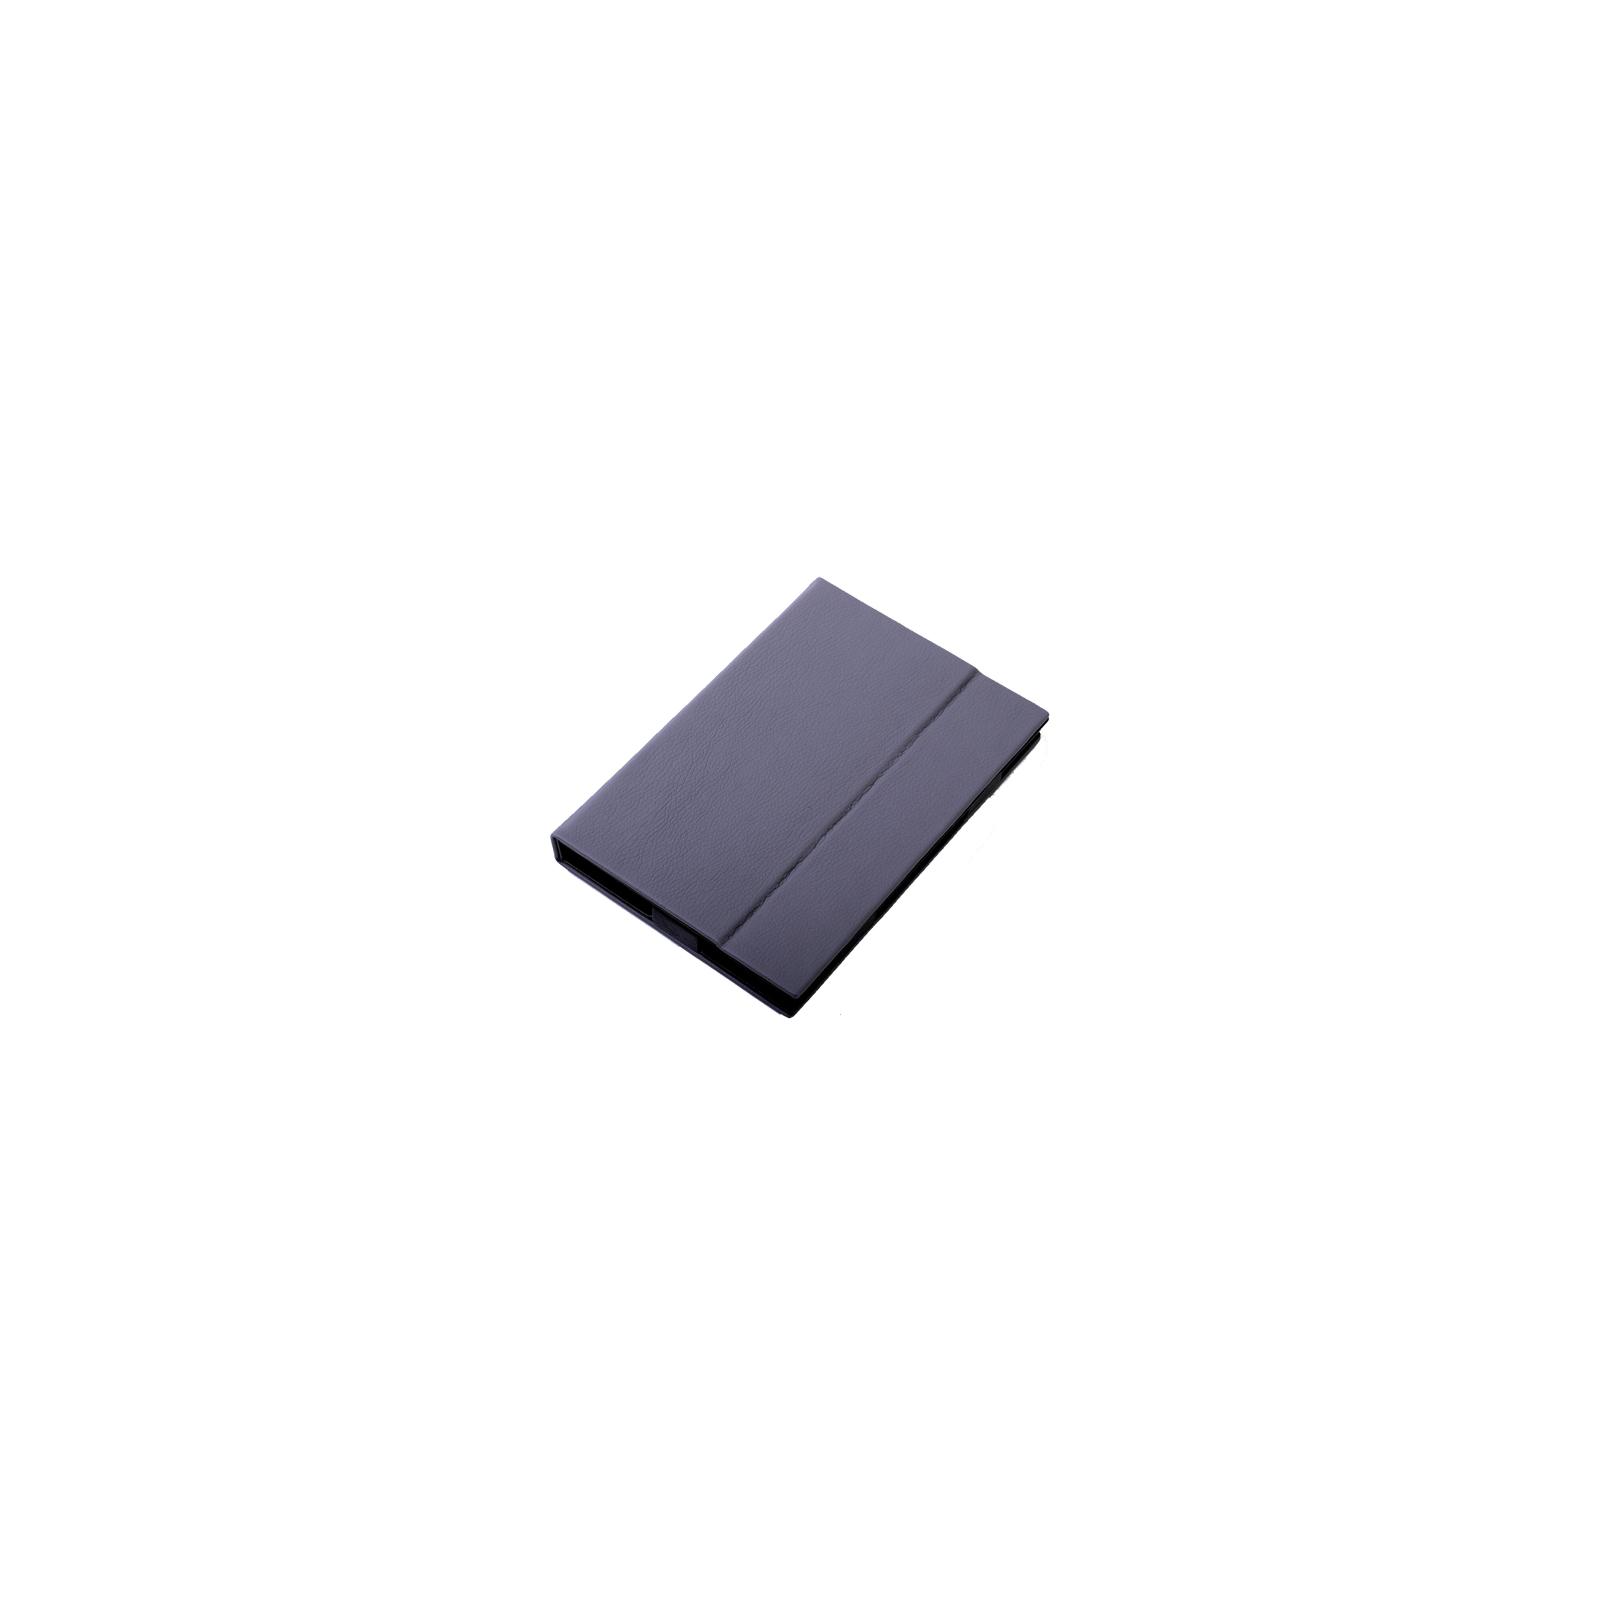 Чехол для планшета Vento 9 Desire Matt - grey